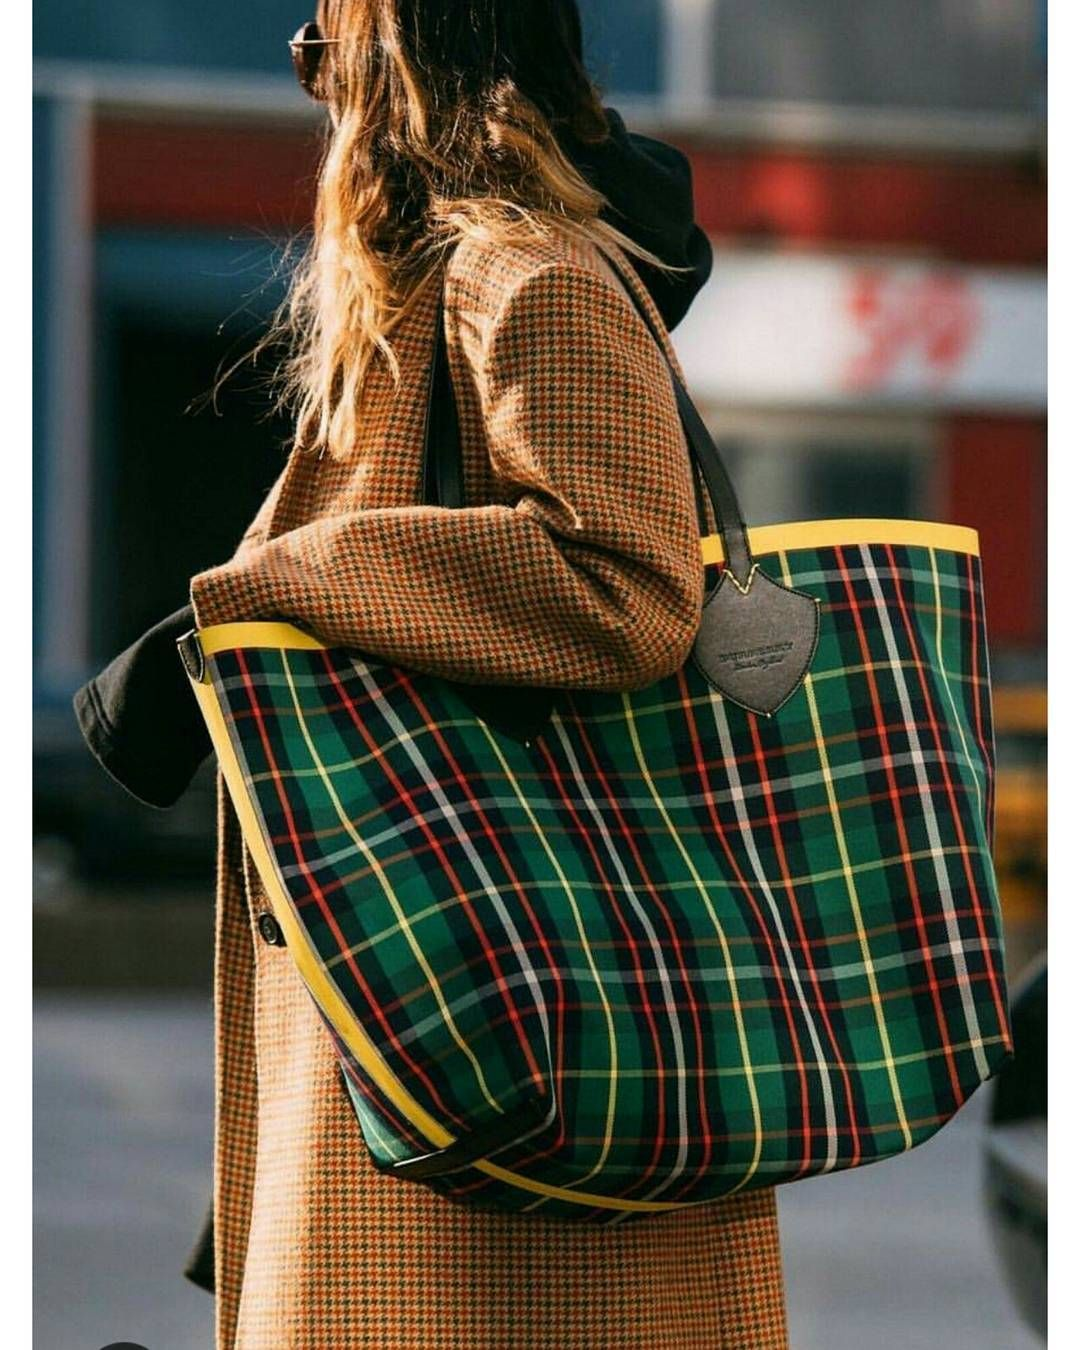 Vane Fashion Style En Plaid Inspiration Pin Bags De Y Farias Bags 7xBzRf